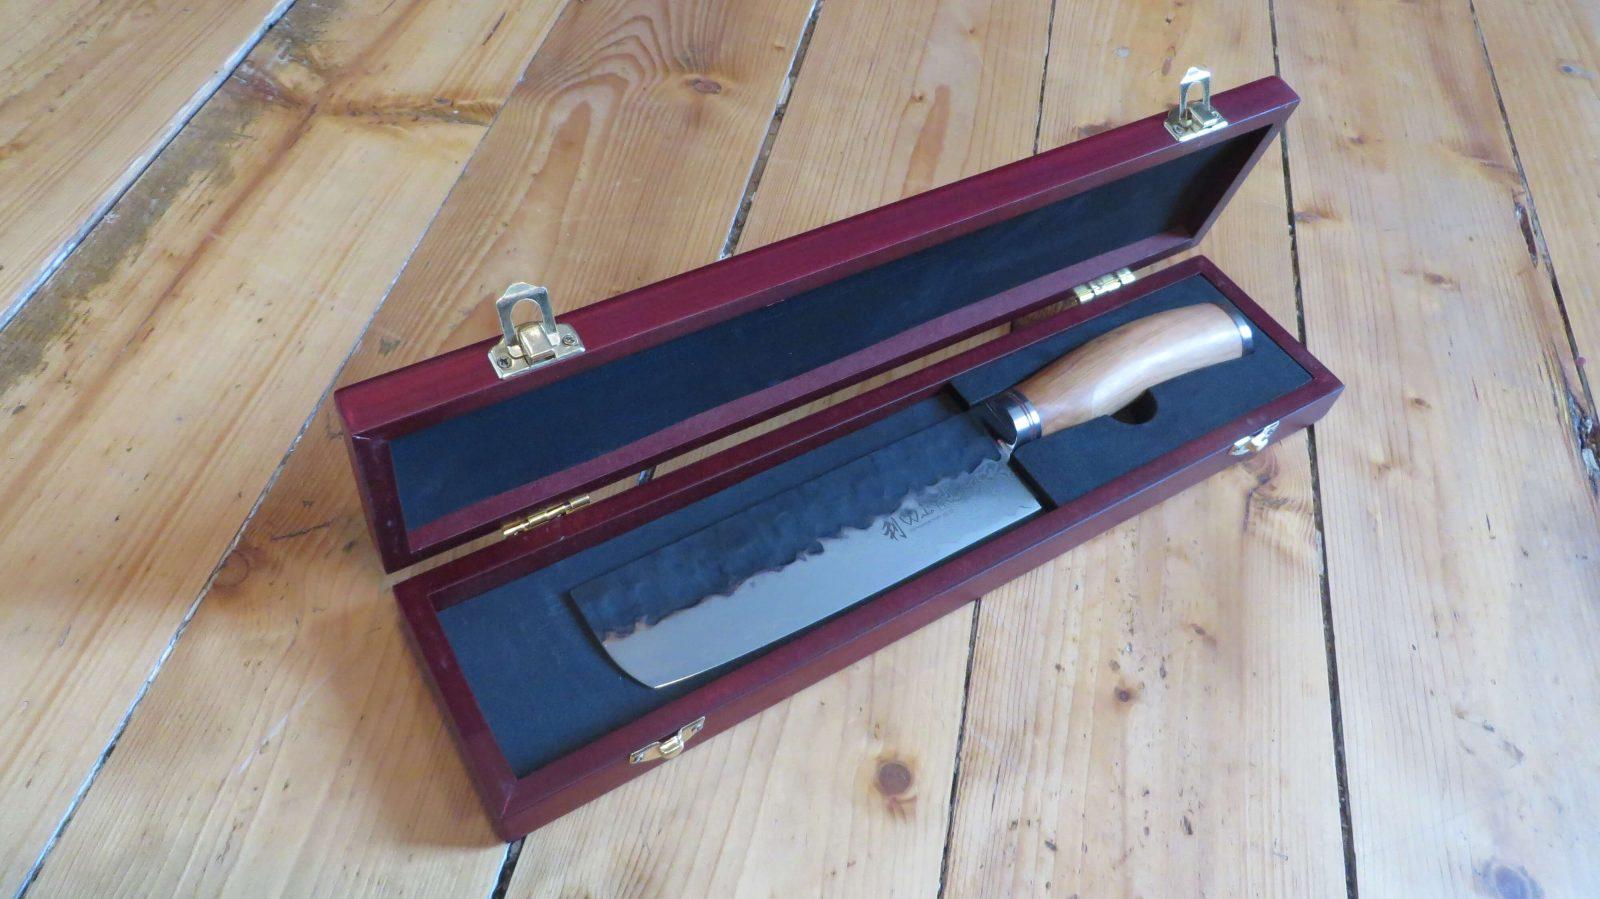 Wakoli Damastmesser in Holzbox